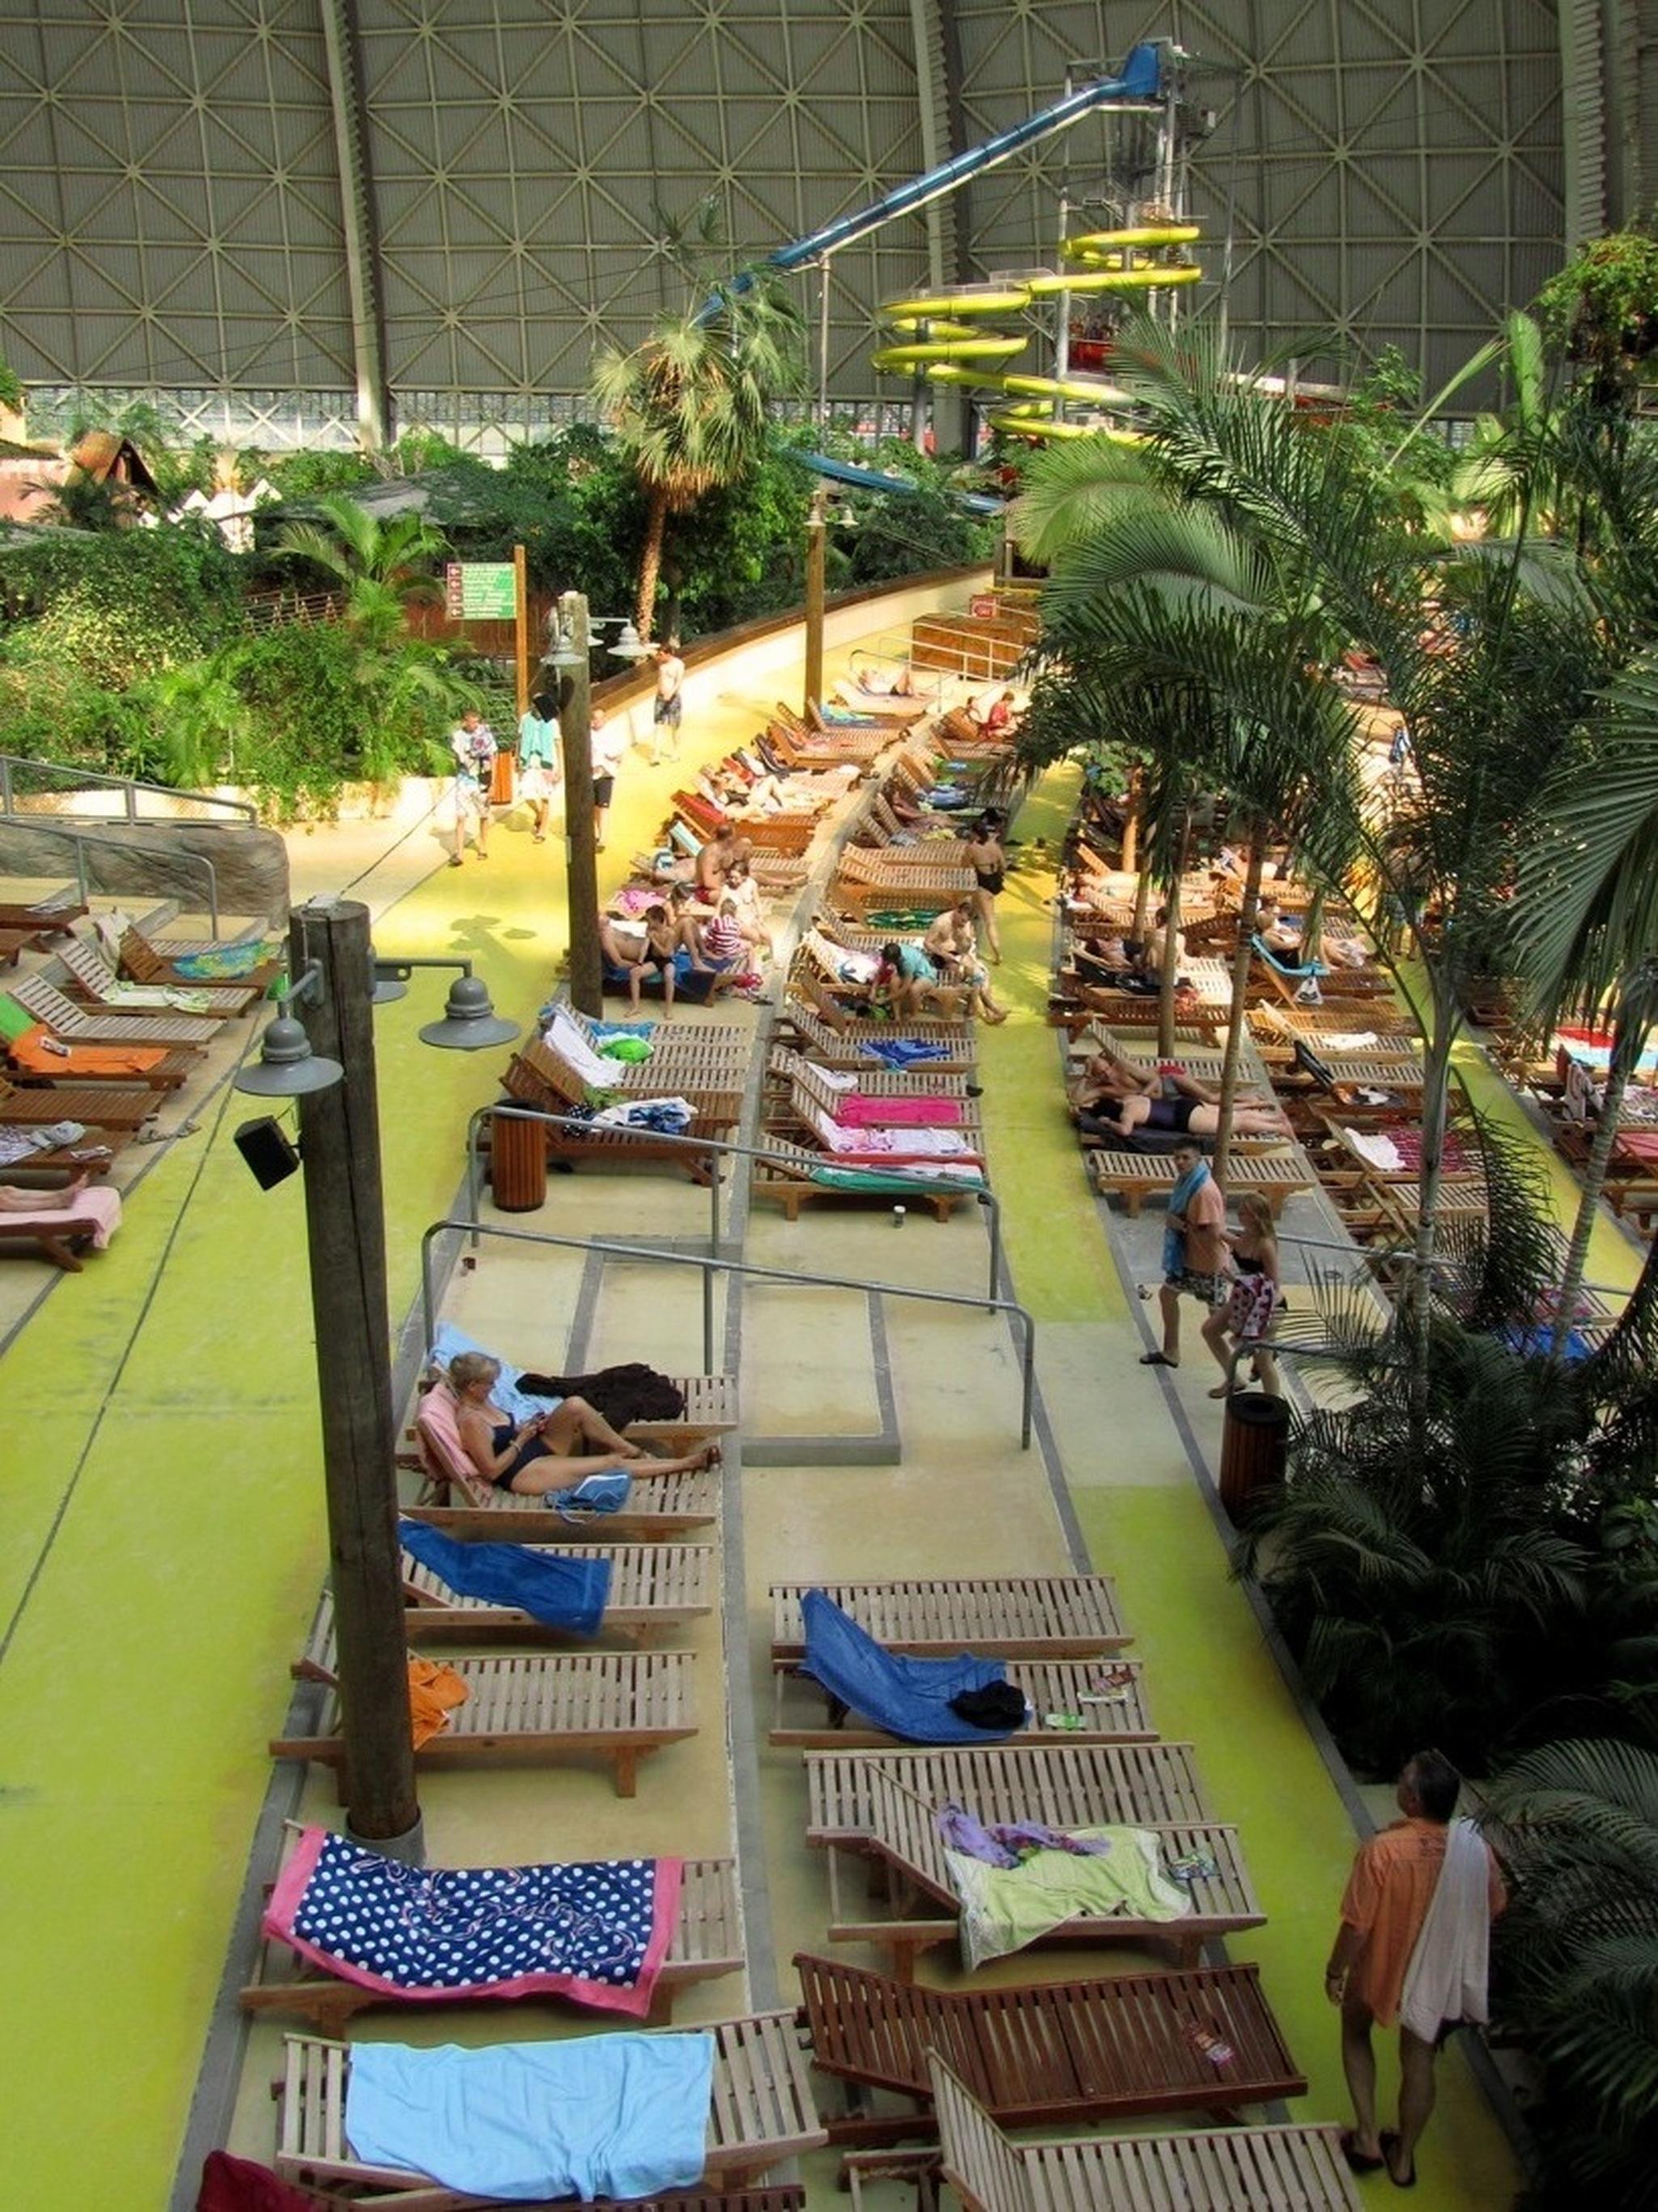 erlebnisbad berlin tropical